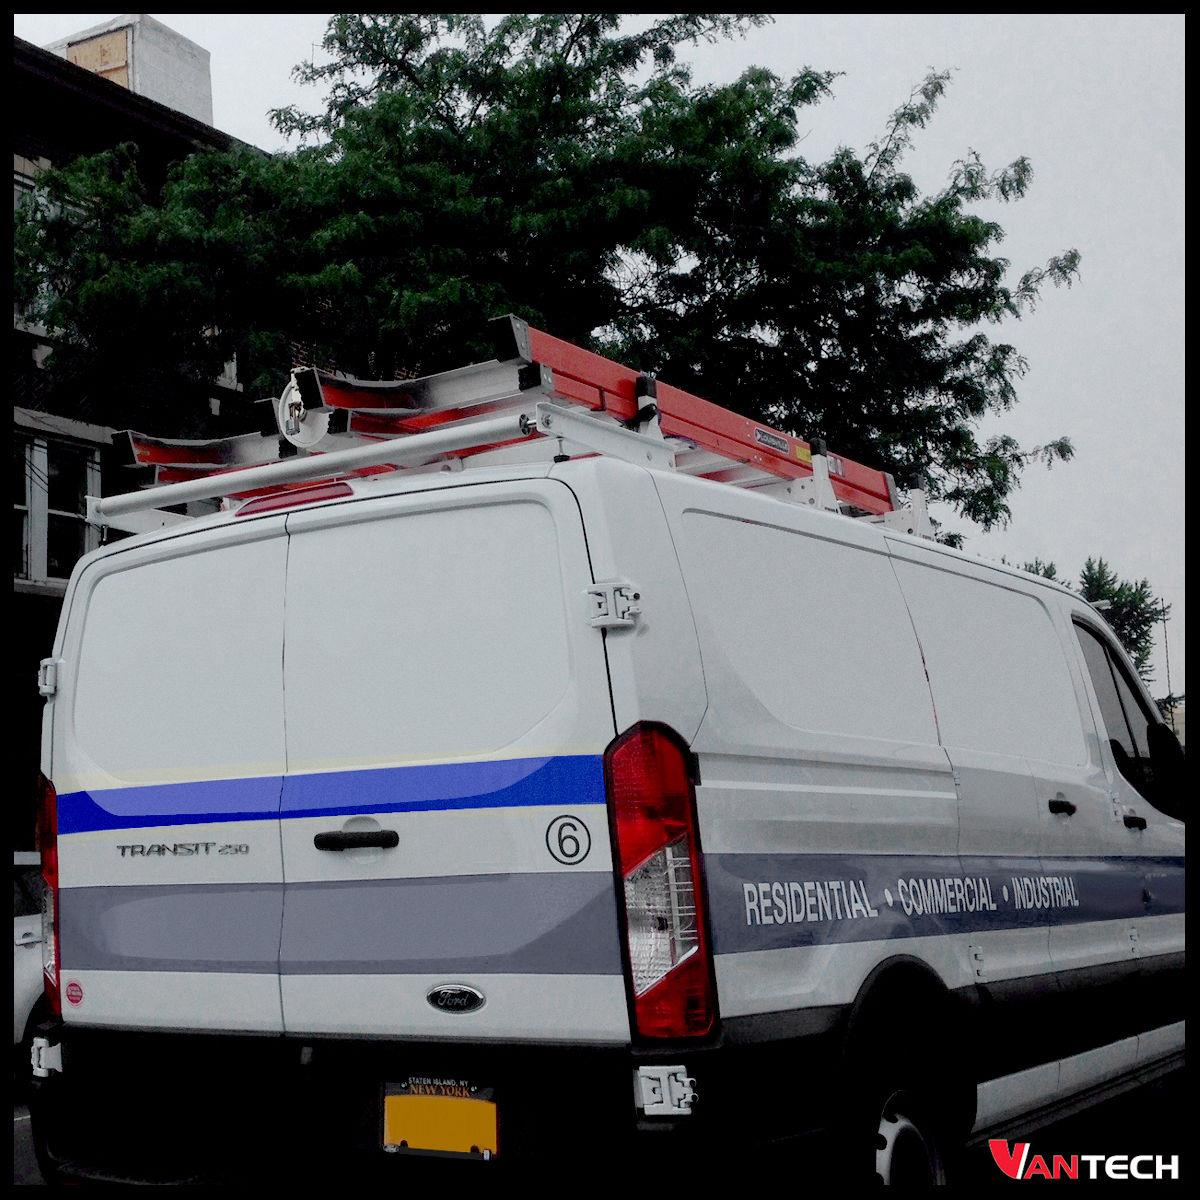 Vantech White H1 2 Bar Steel Ladder Roof Rack Ford Transit Cargo 2015-On Fits